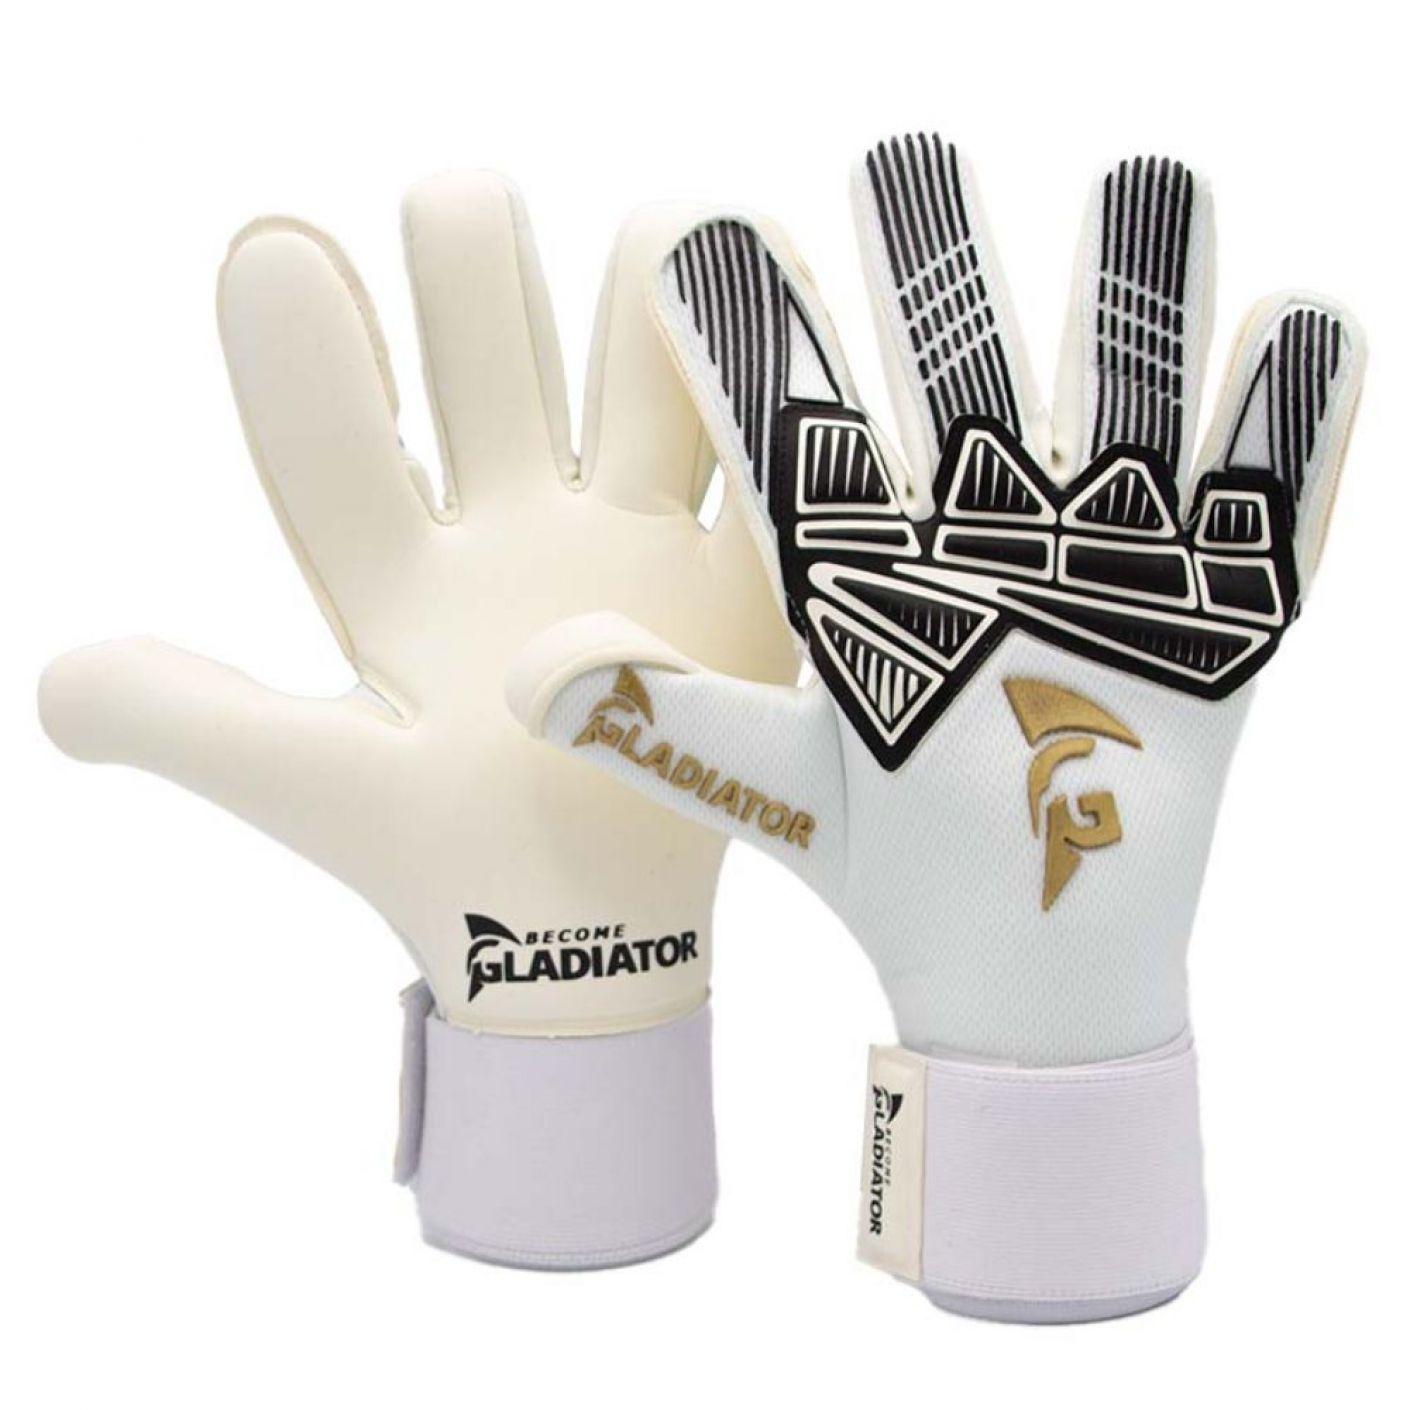 Gladiator Sports Rangatira Keepershandschoenen Wit Zwart Goud